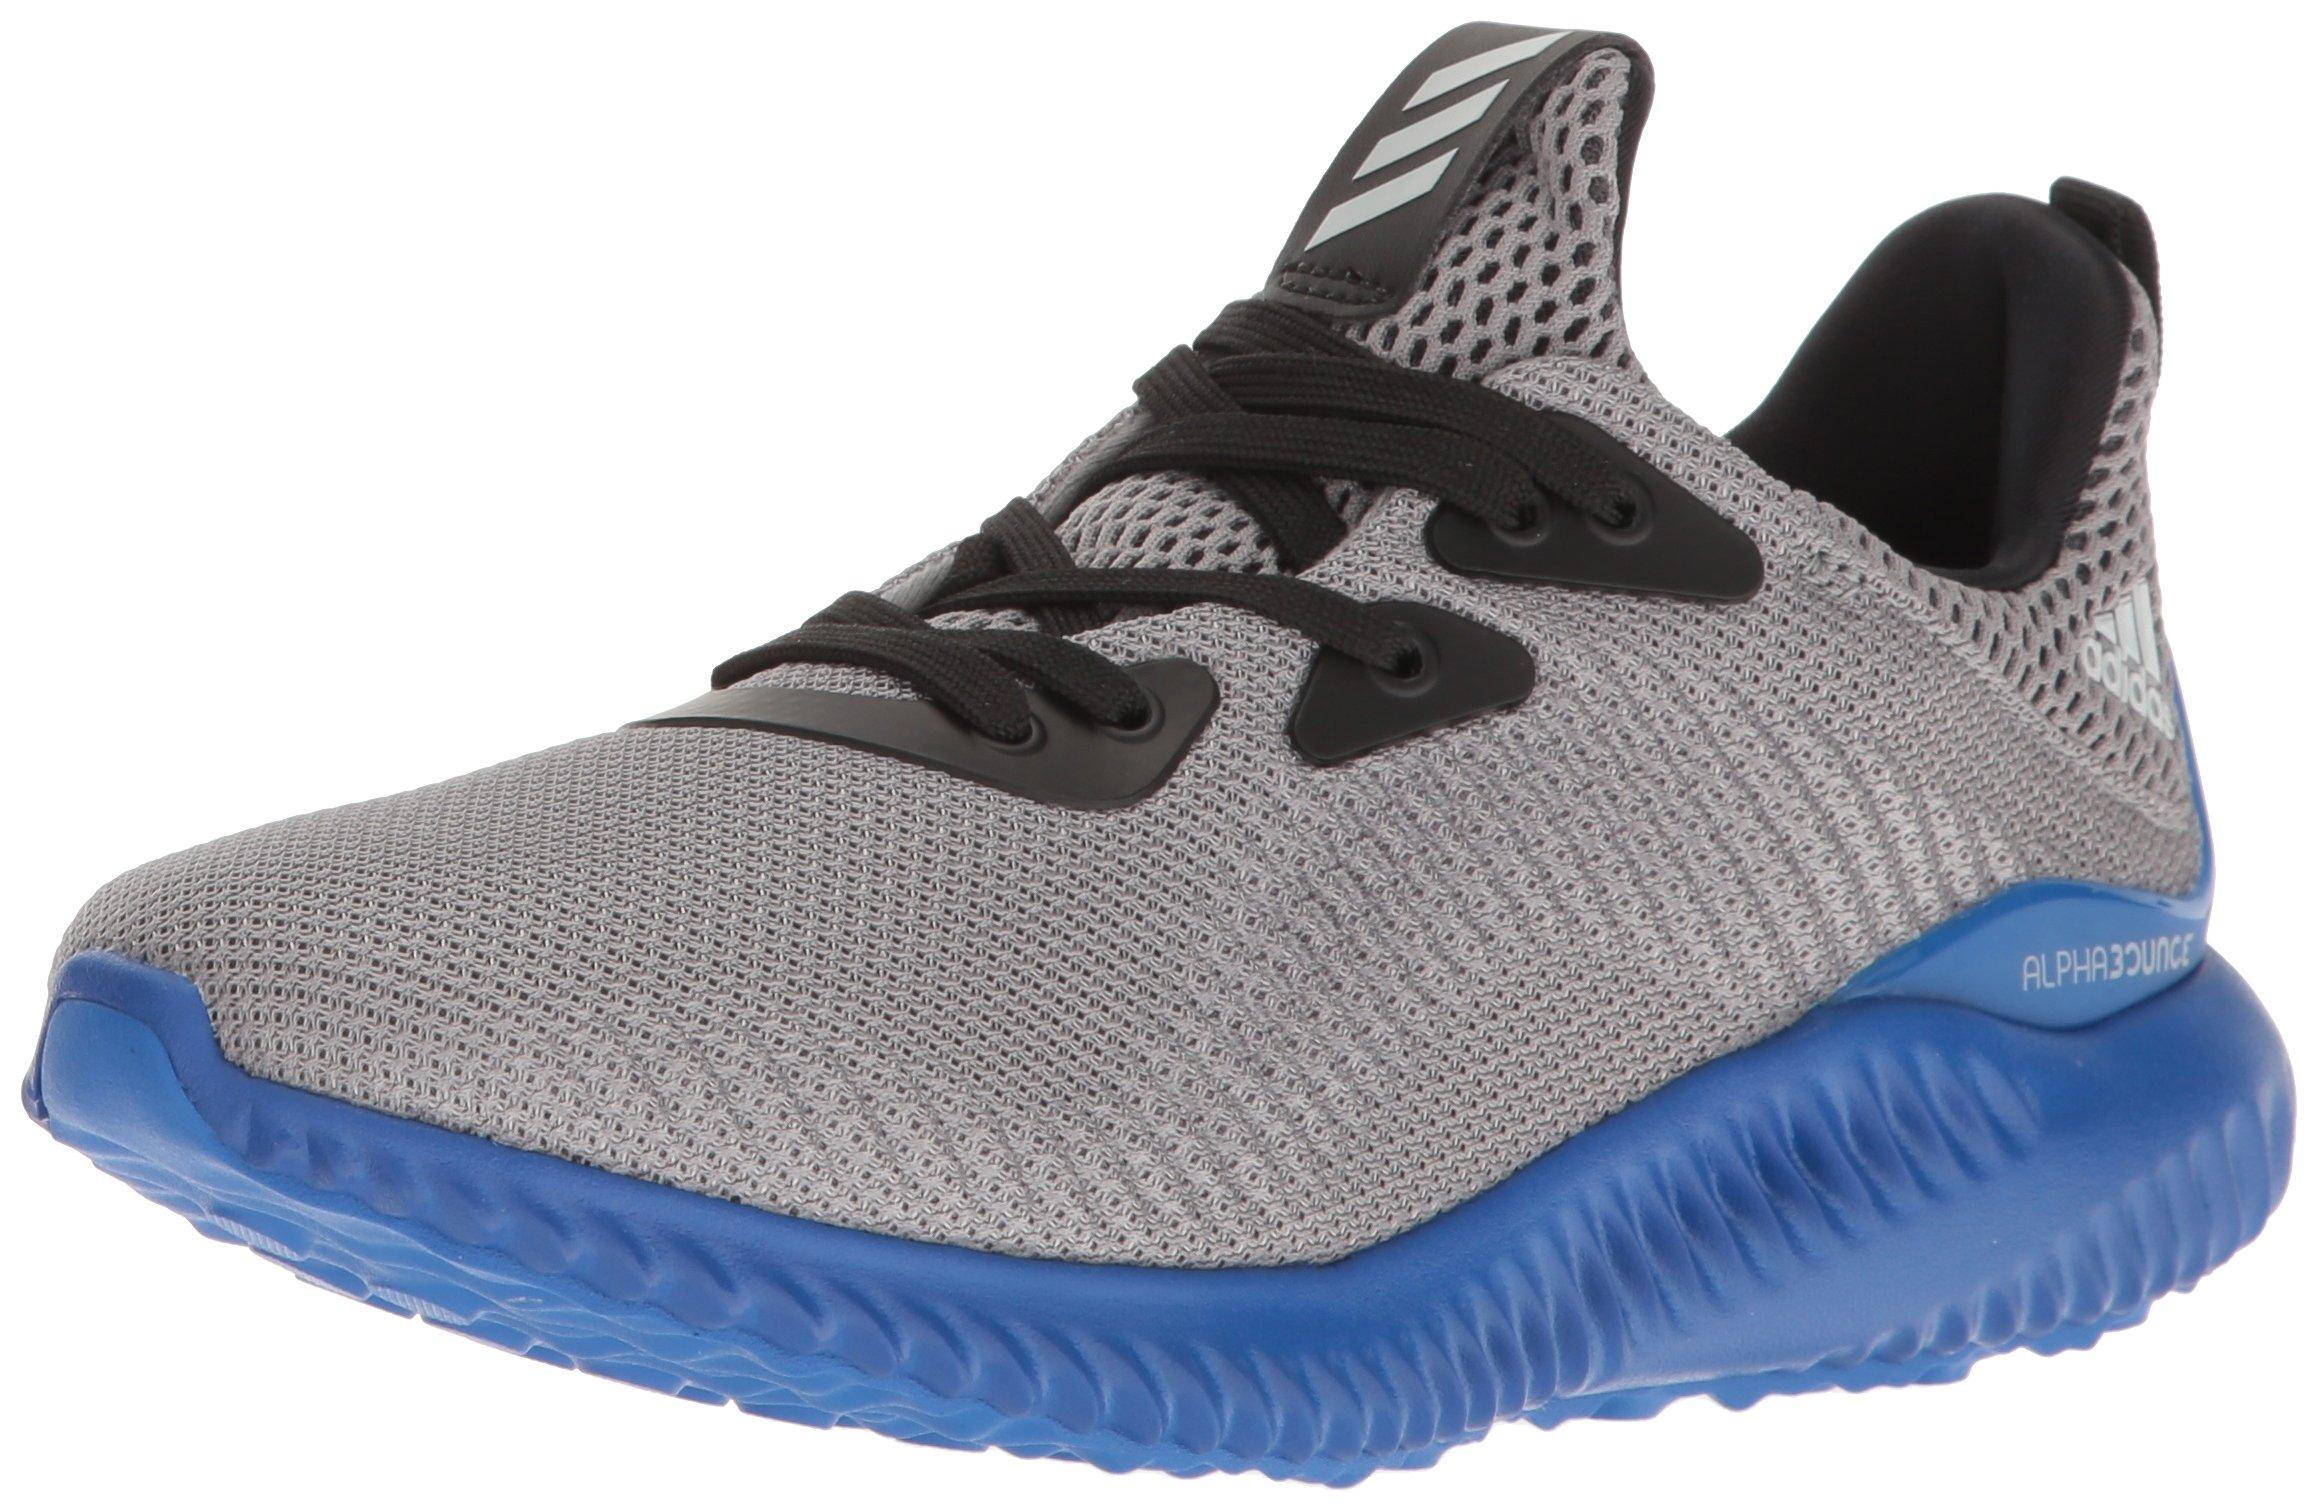 adidas Performance Boys' Alphabounce j Running Shoe, Grey/Light Onix/Blue, 6.5 M US Big Kid by adidas